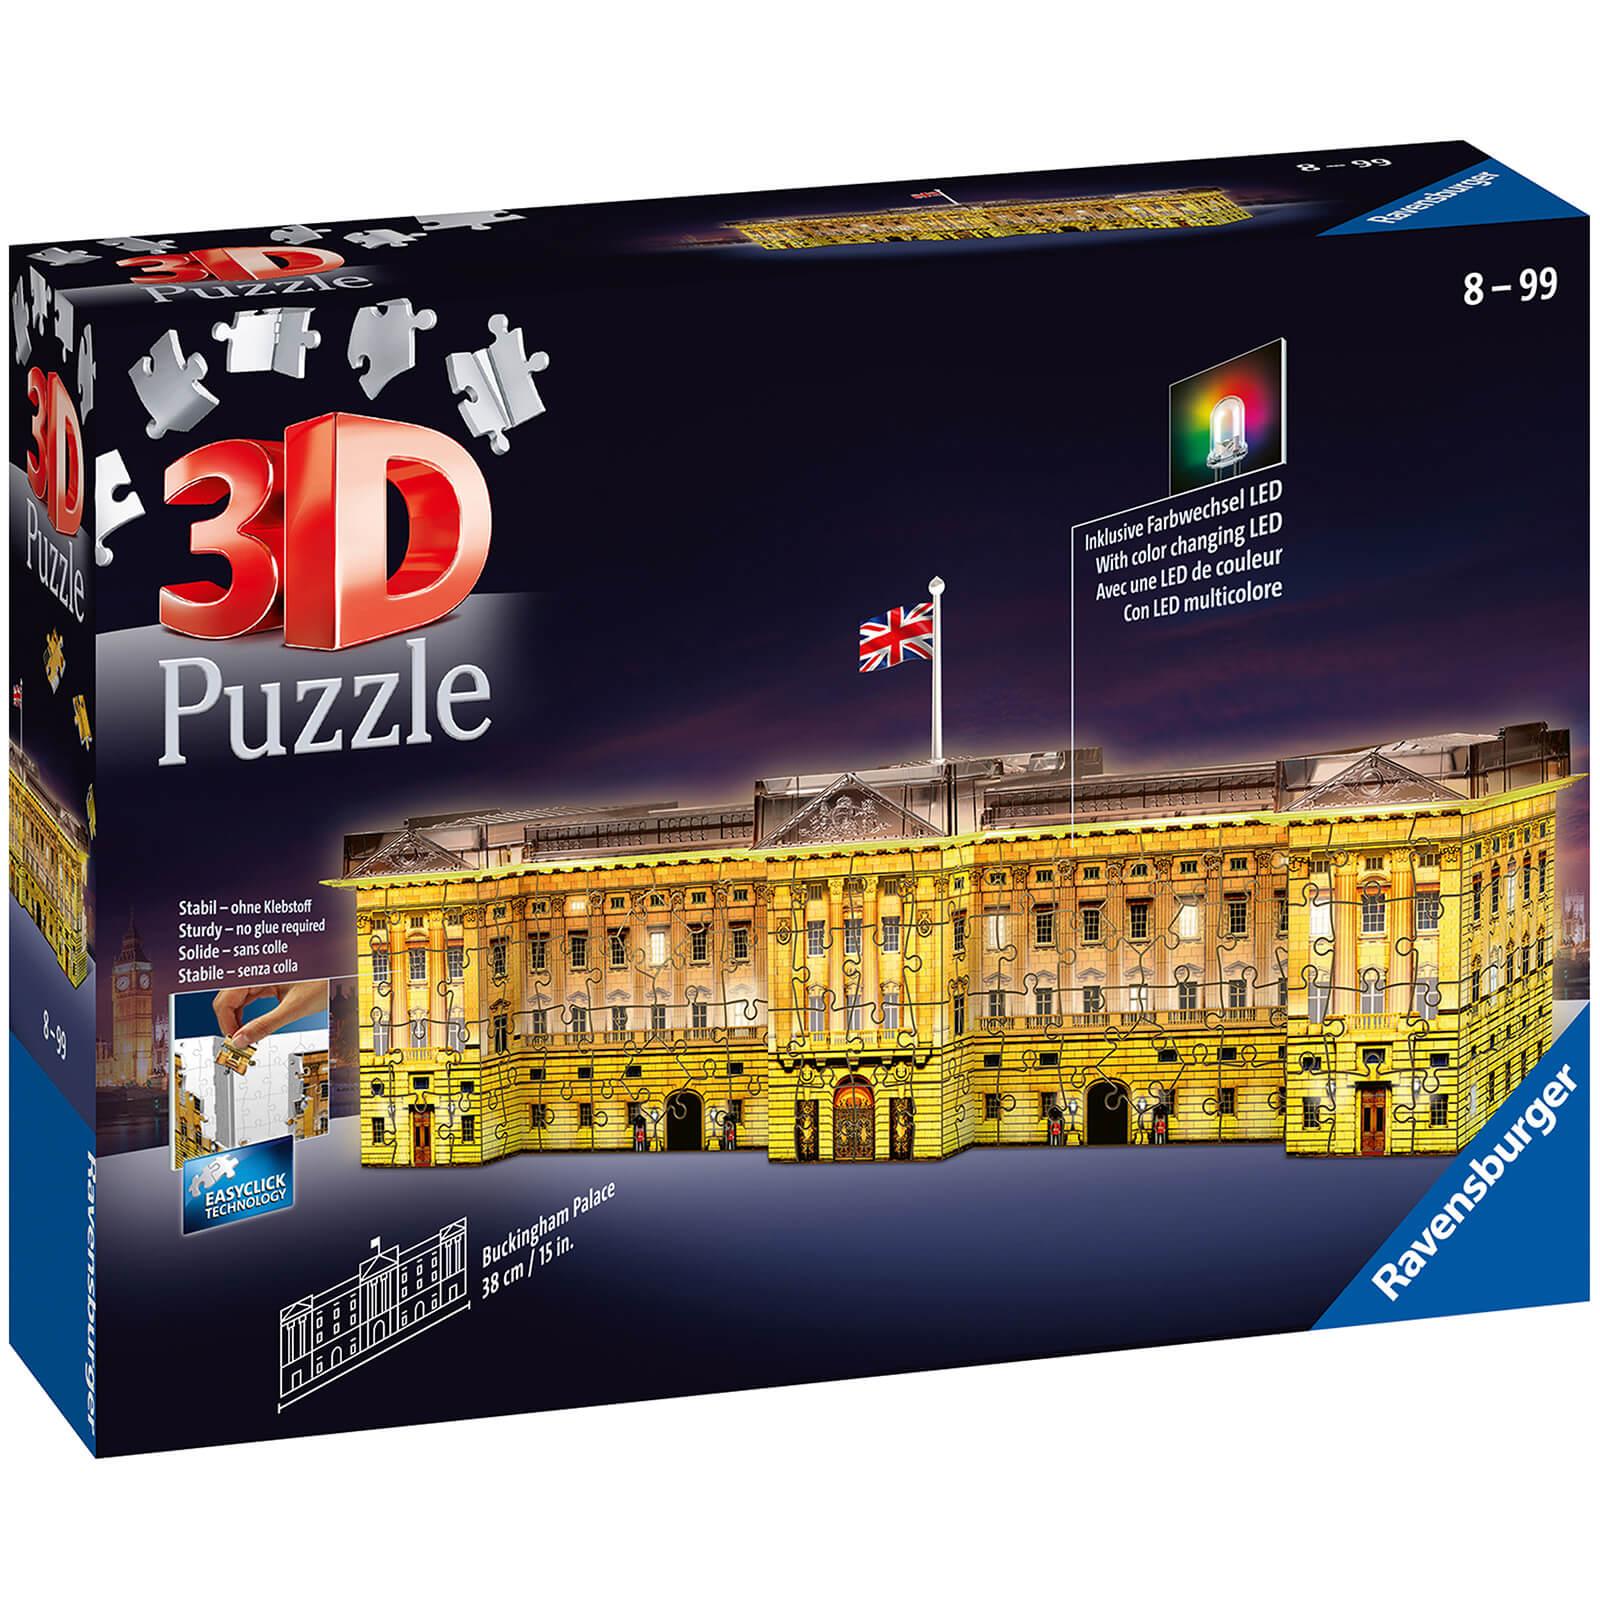 Ravensburger Buckingham Palace Night Edition 3D Puzzle (216 Pieces)